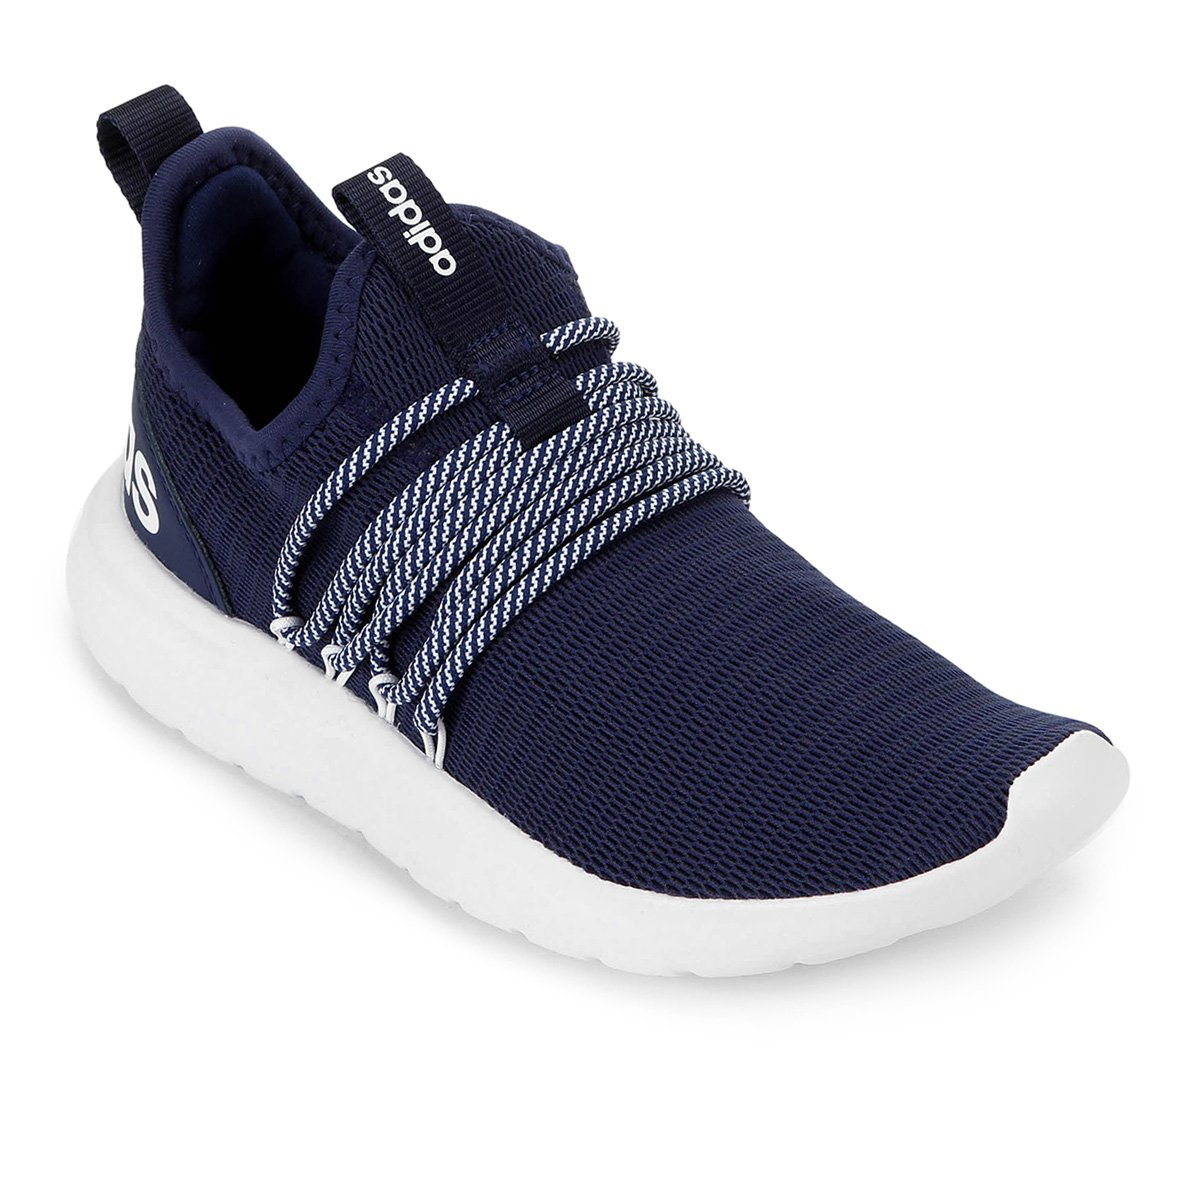 Tênis Adidas Lite Racer Adapt Masculino - Azul e Branco